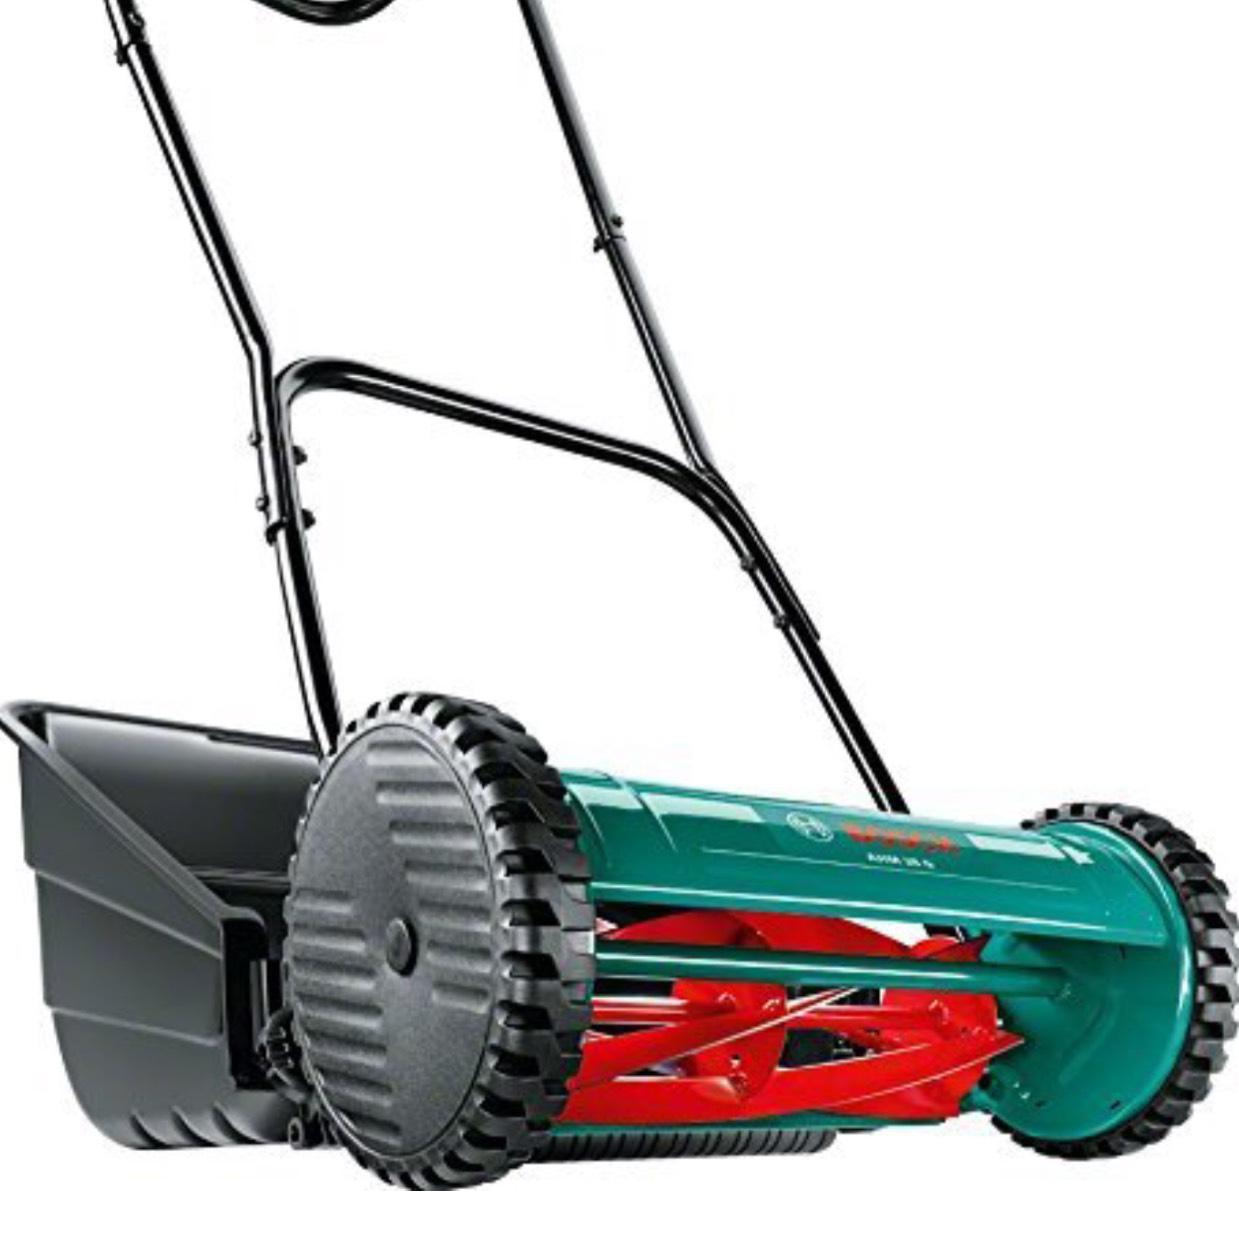 Bosch AHM 38 G Manual Garden Lawn Mower £38 @ Amazon